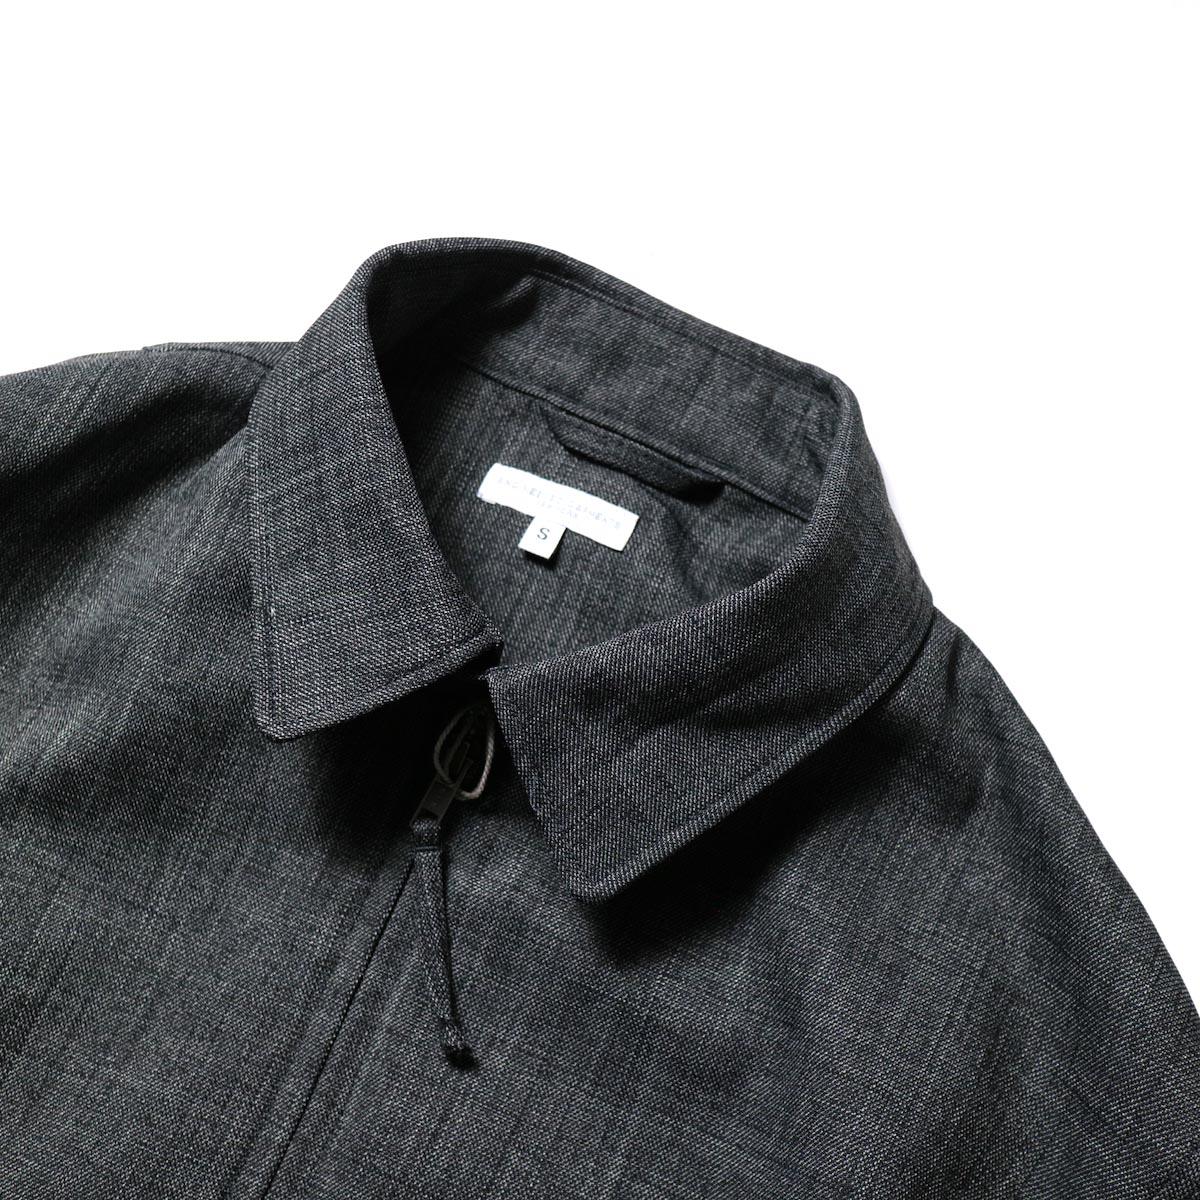 Engineered Garments / Claigton Jacket - Polyester Sharkskin (Charcoal)襟